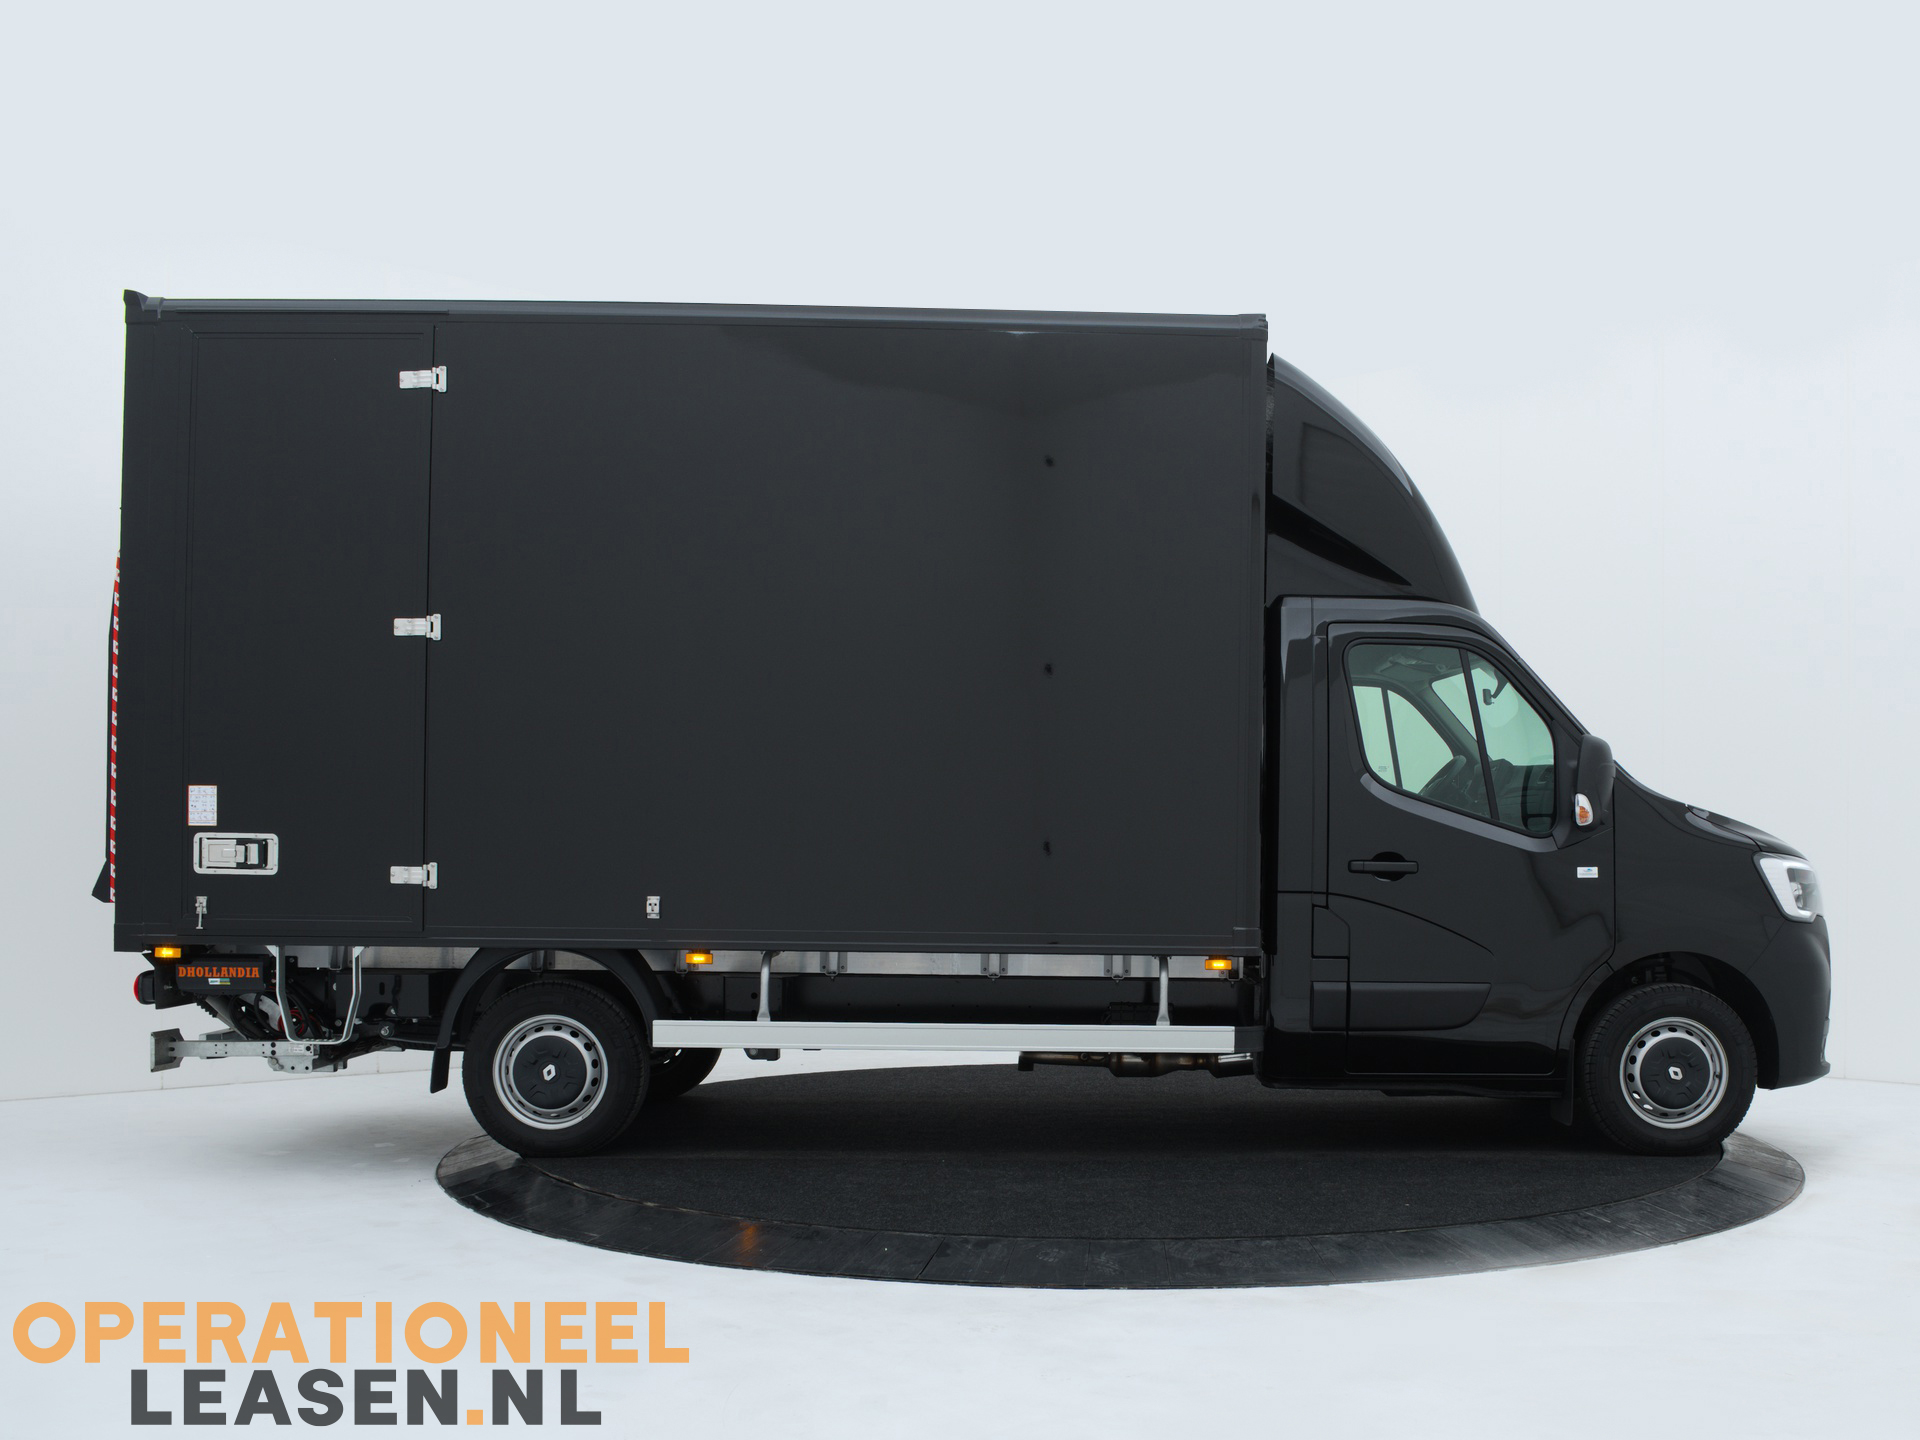 Operational lease zwarte bakwagen-14